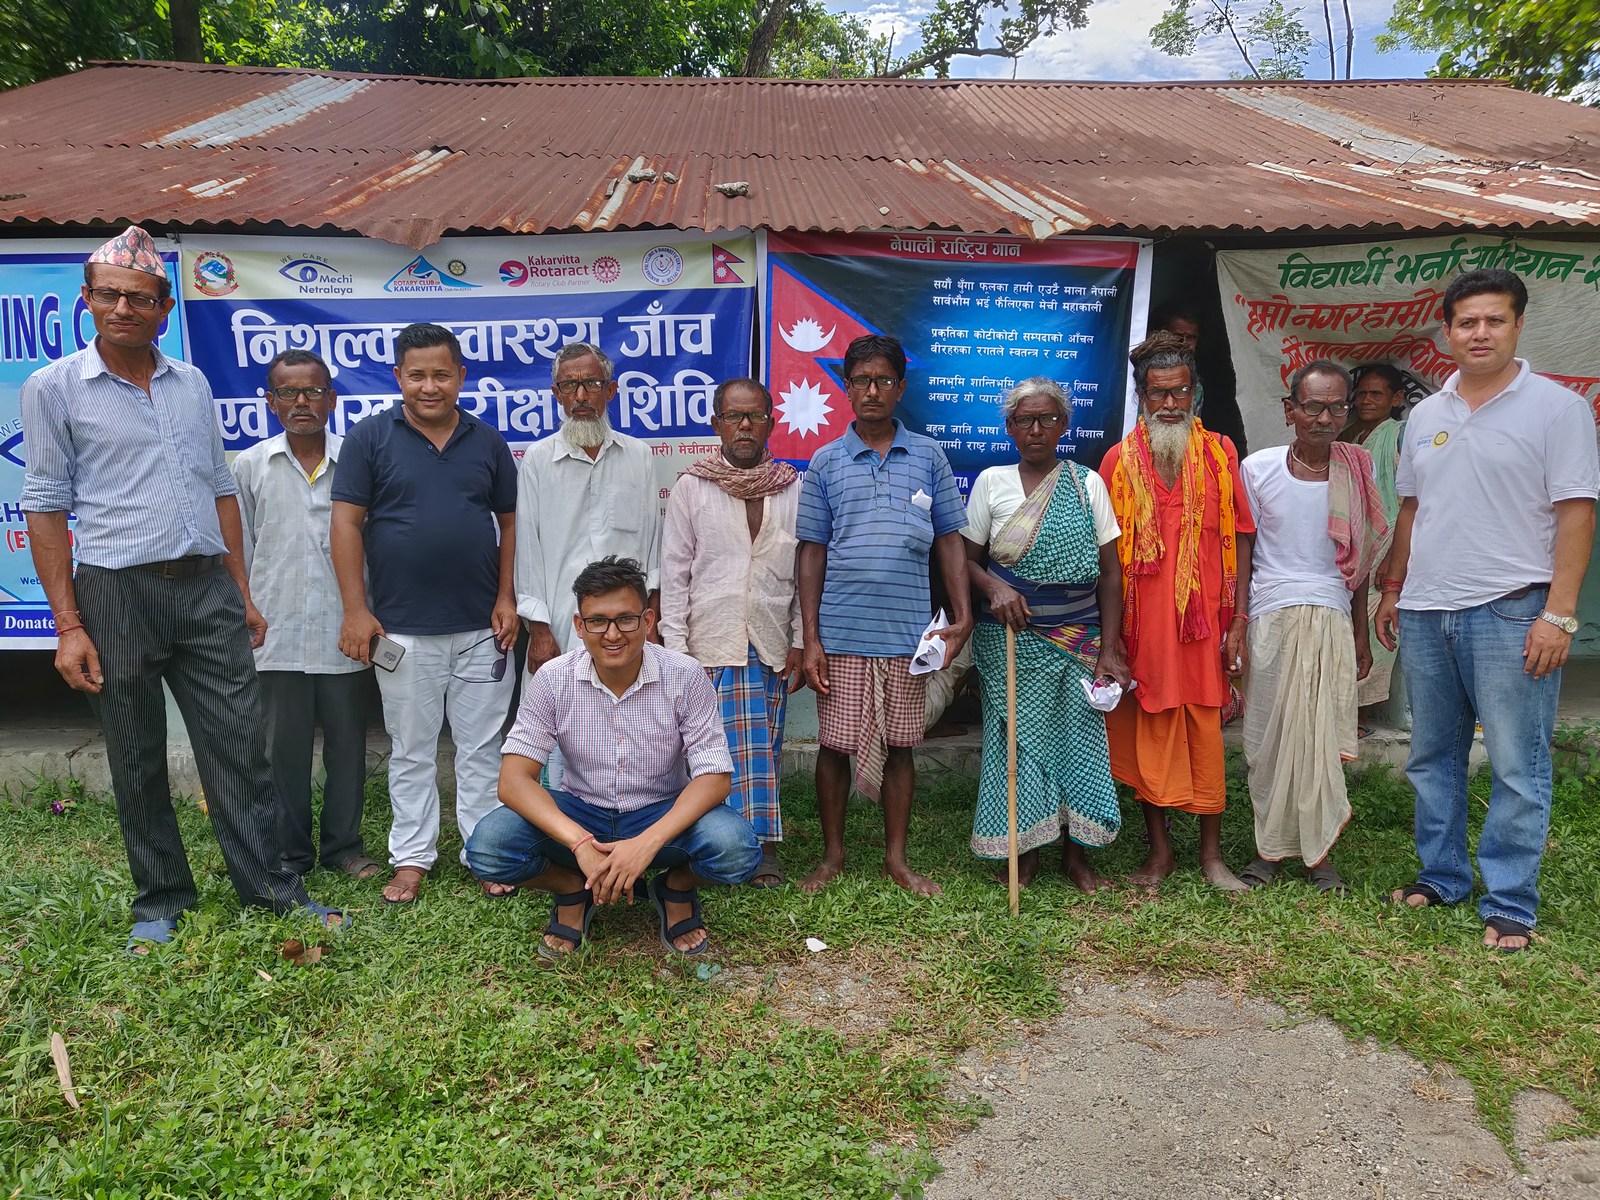 Free-Health-Camp-Eye-Screening-at-Gwala-Basti-Mechinagar-15-Jhapa-Nepal-Rotary-Club-of-Kakarvitta-31